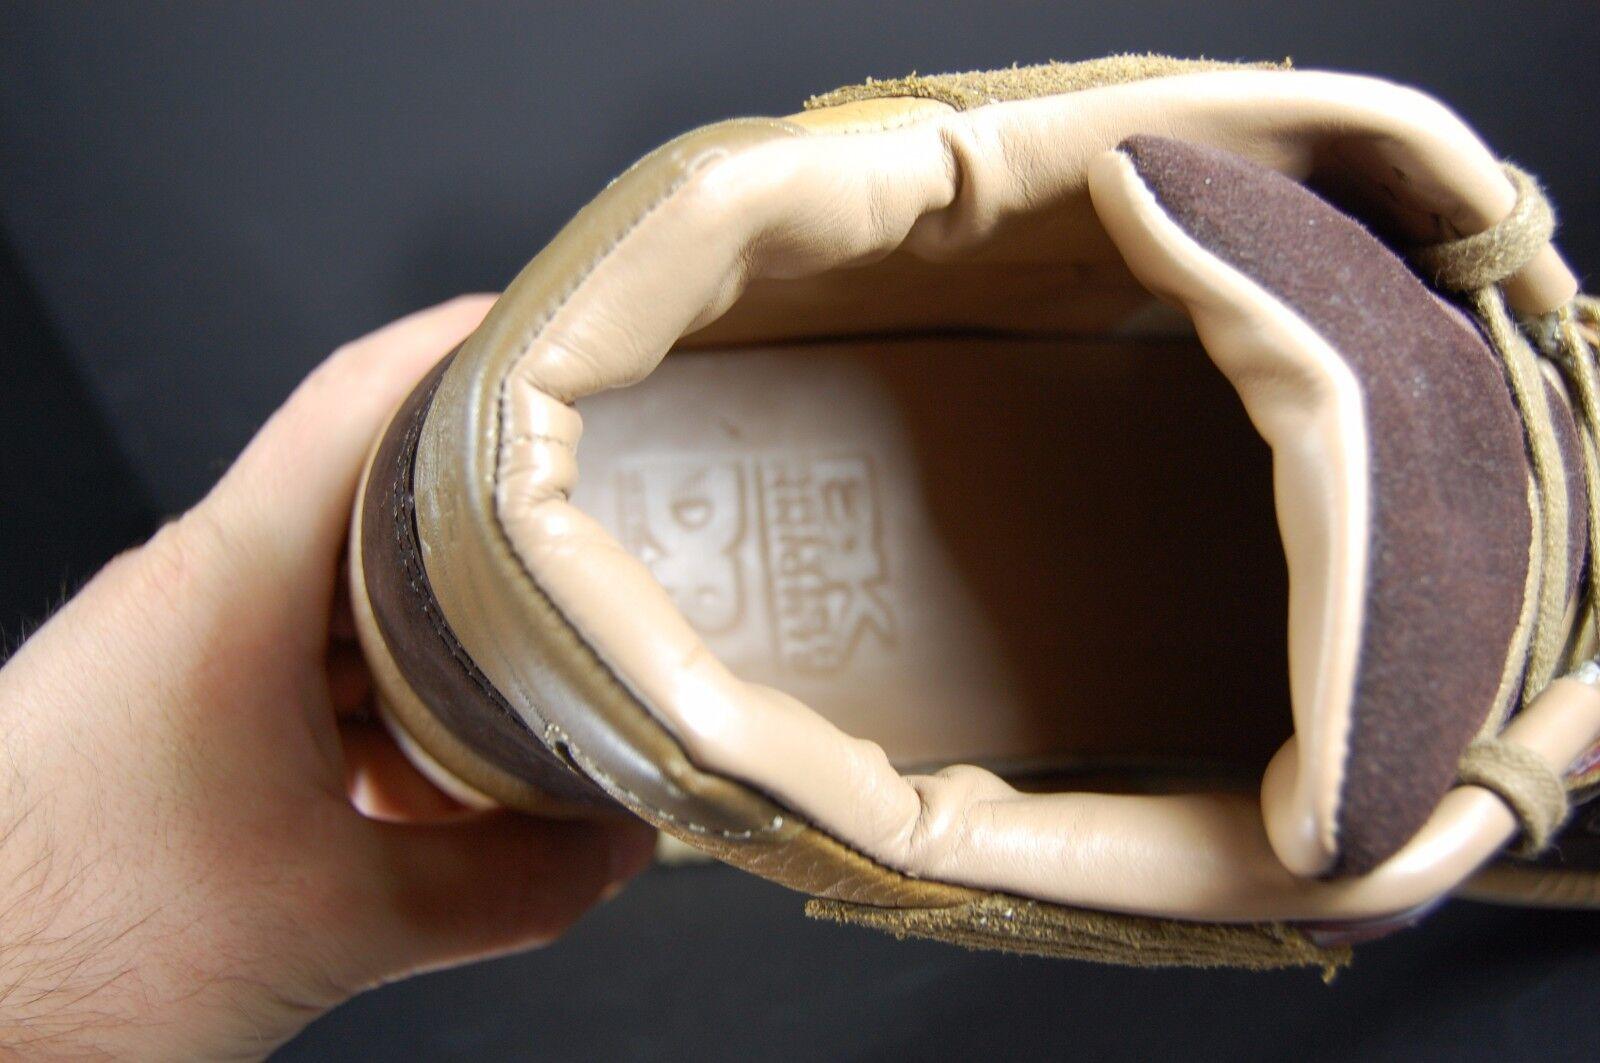 LIMITED EDITION  British Knights Butter DRX Mono Mid Peanut Butter Knights   EU 47.5 US 14 61f9cd